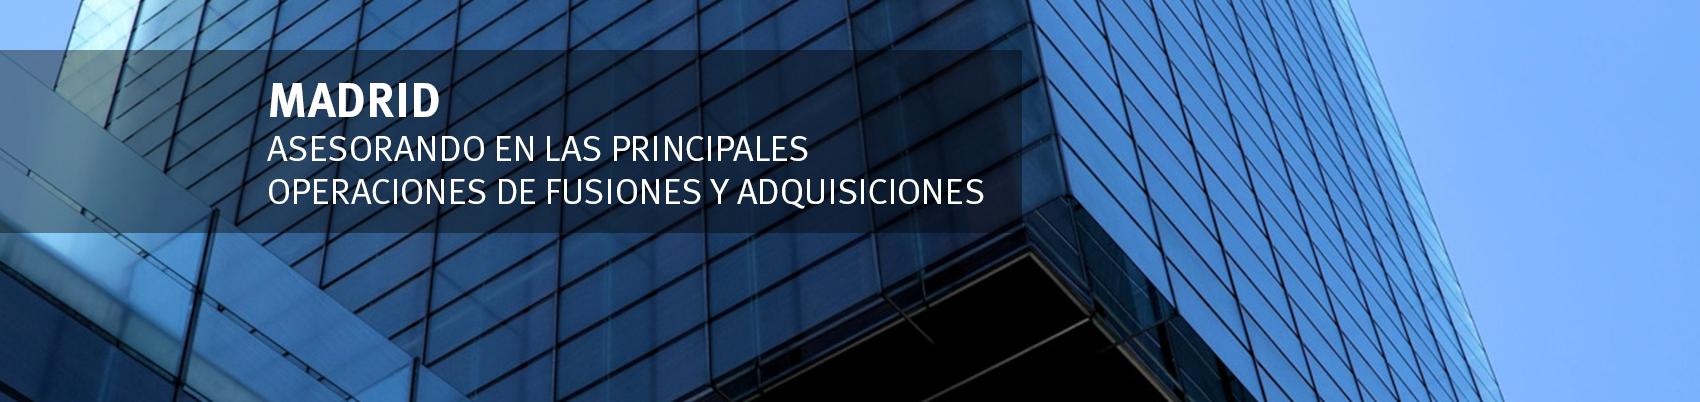 Madrid oficinas for Oficina de extranjeros madrid